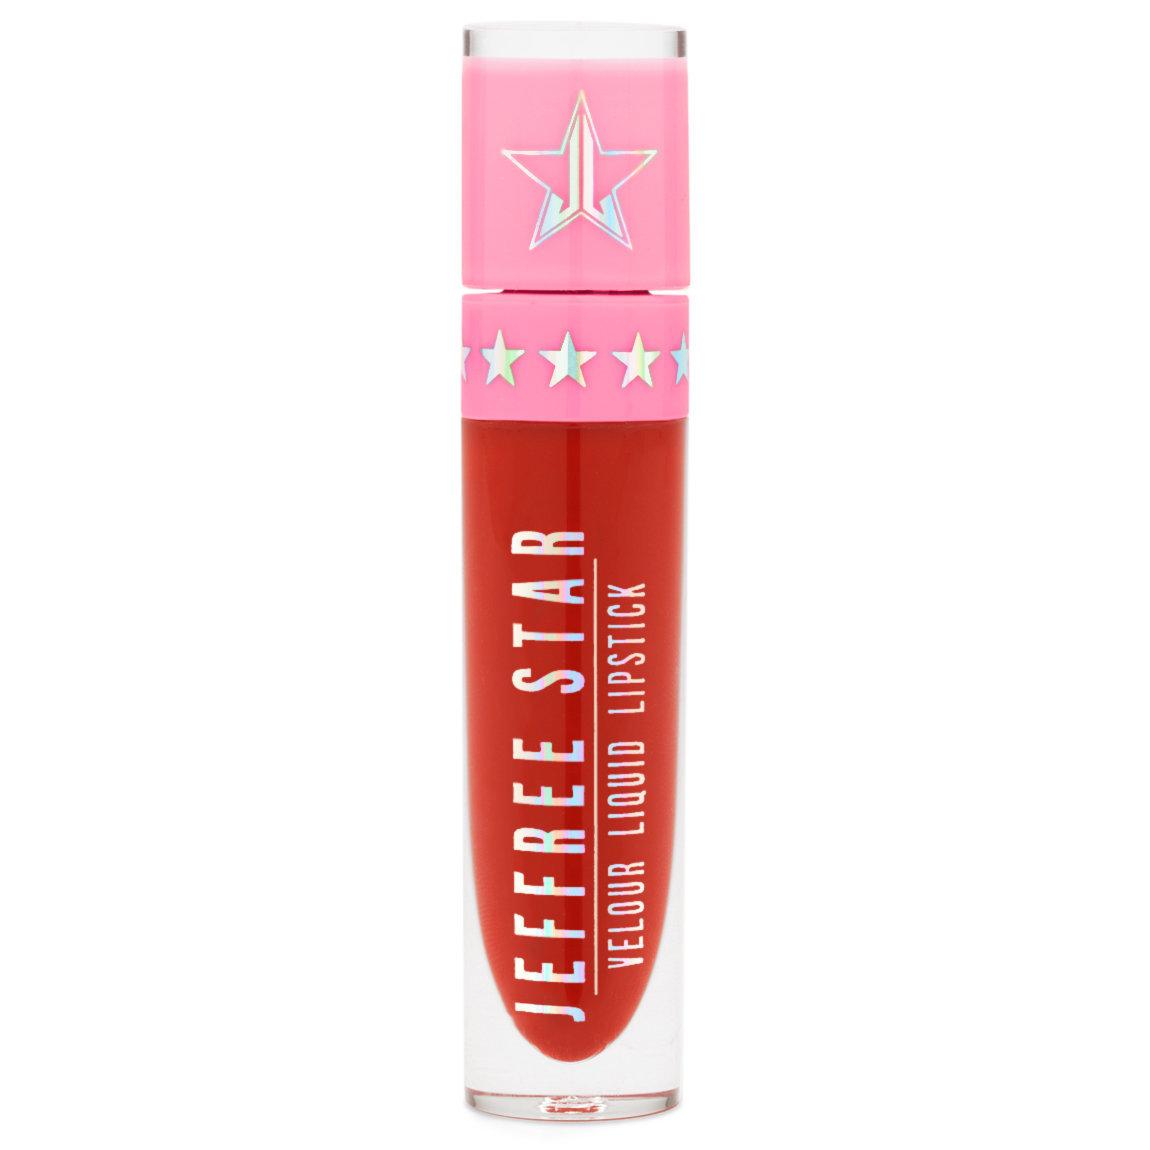 Jeffree Star Cosmetics Velour Liquid Lipstick Wifey